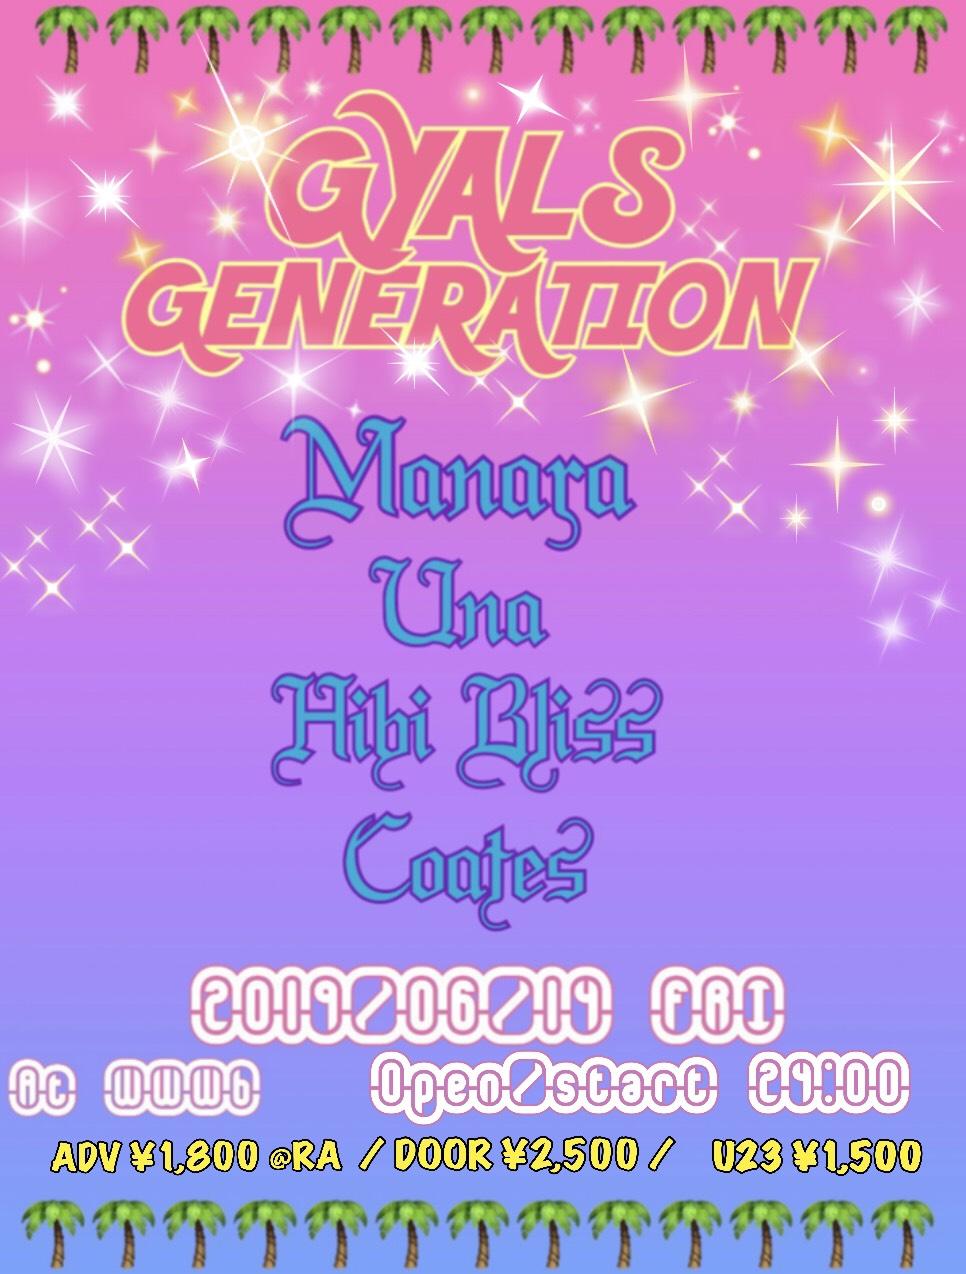 Gyals Generation